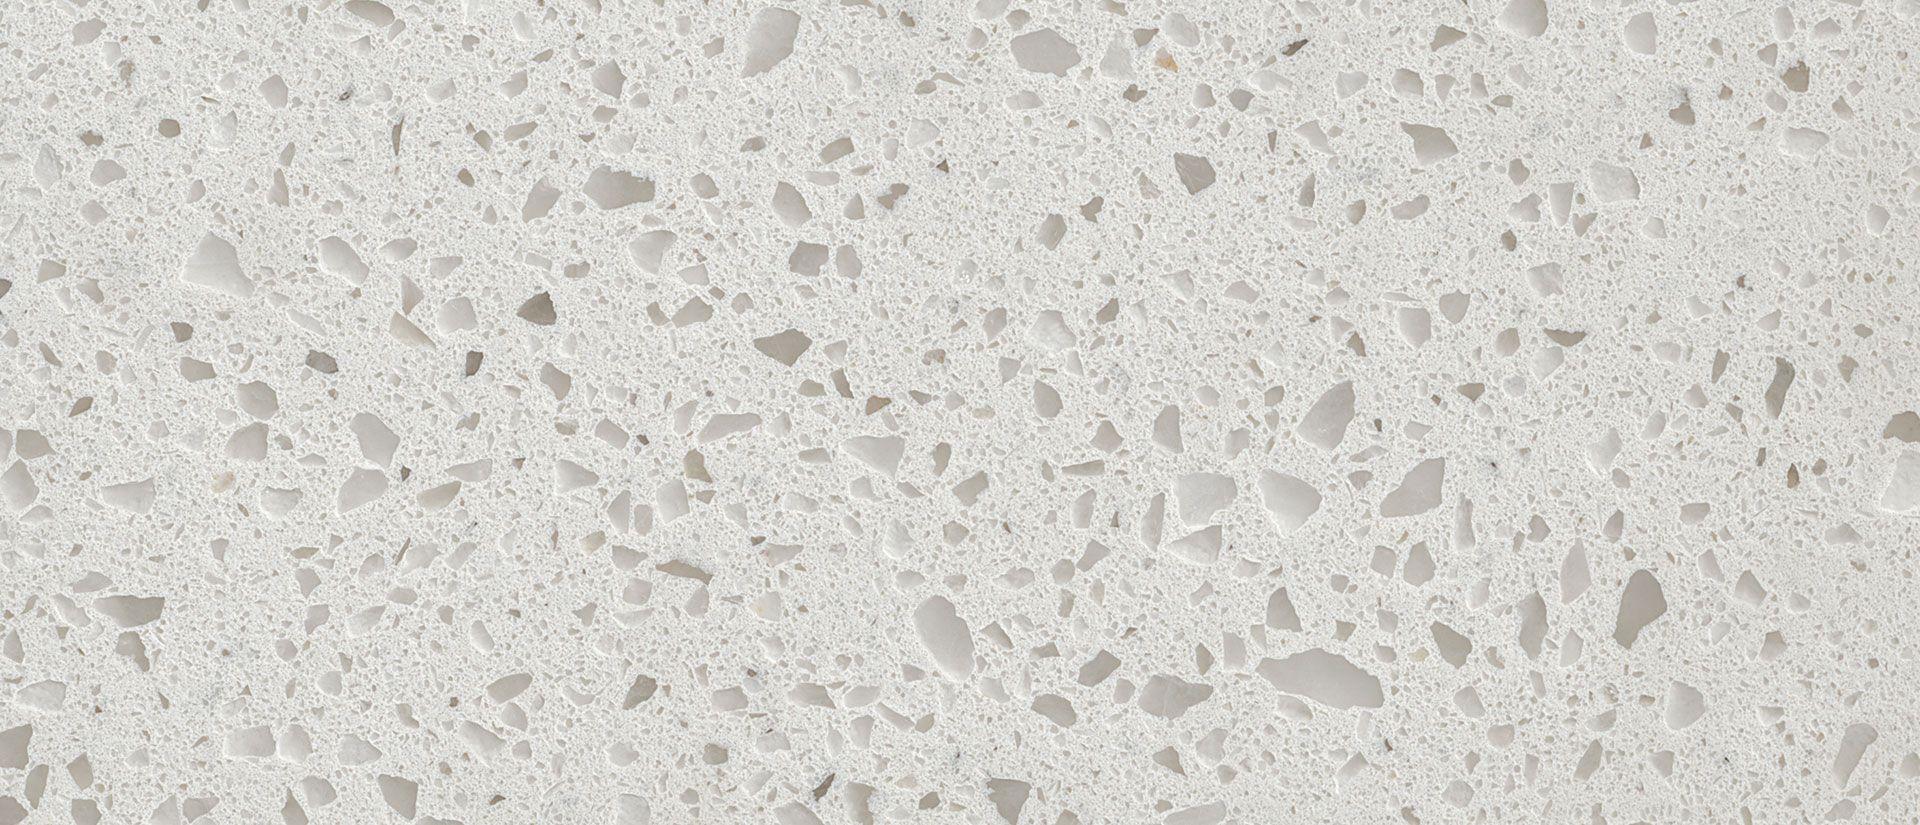 Tier 1 Iced White Quartz Countertops White Quartz Countertop White Quartz